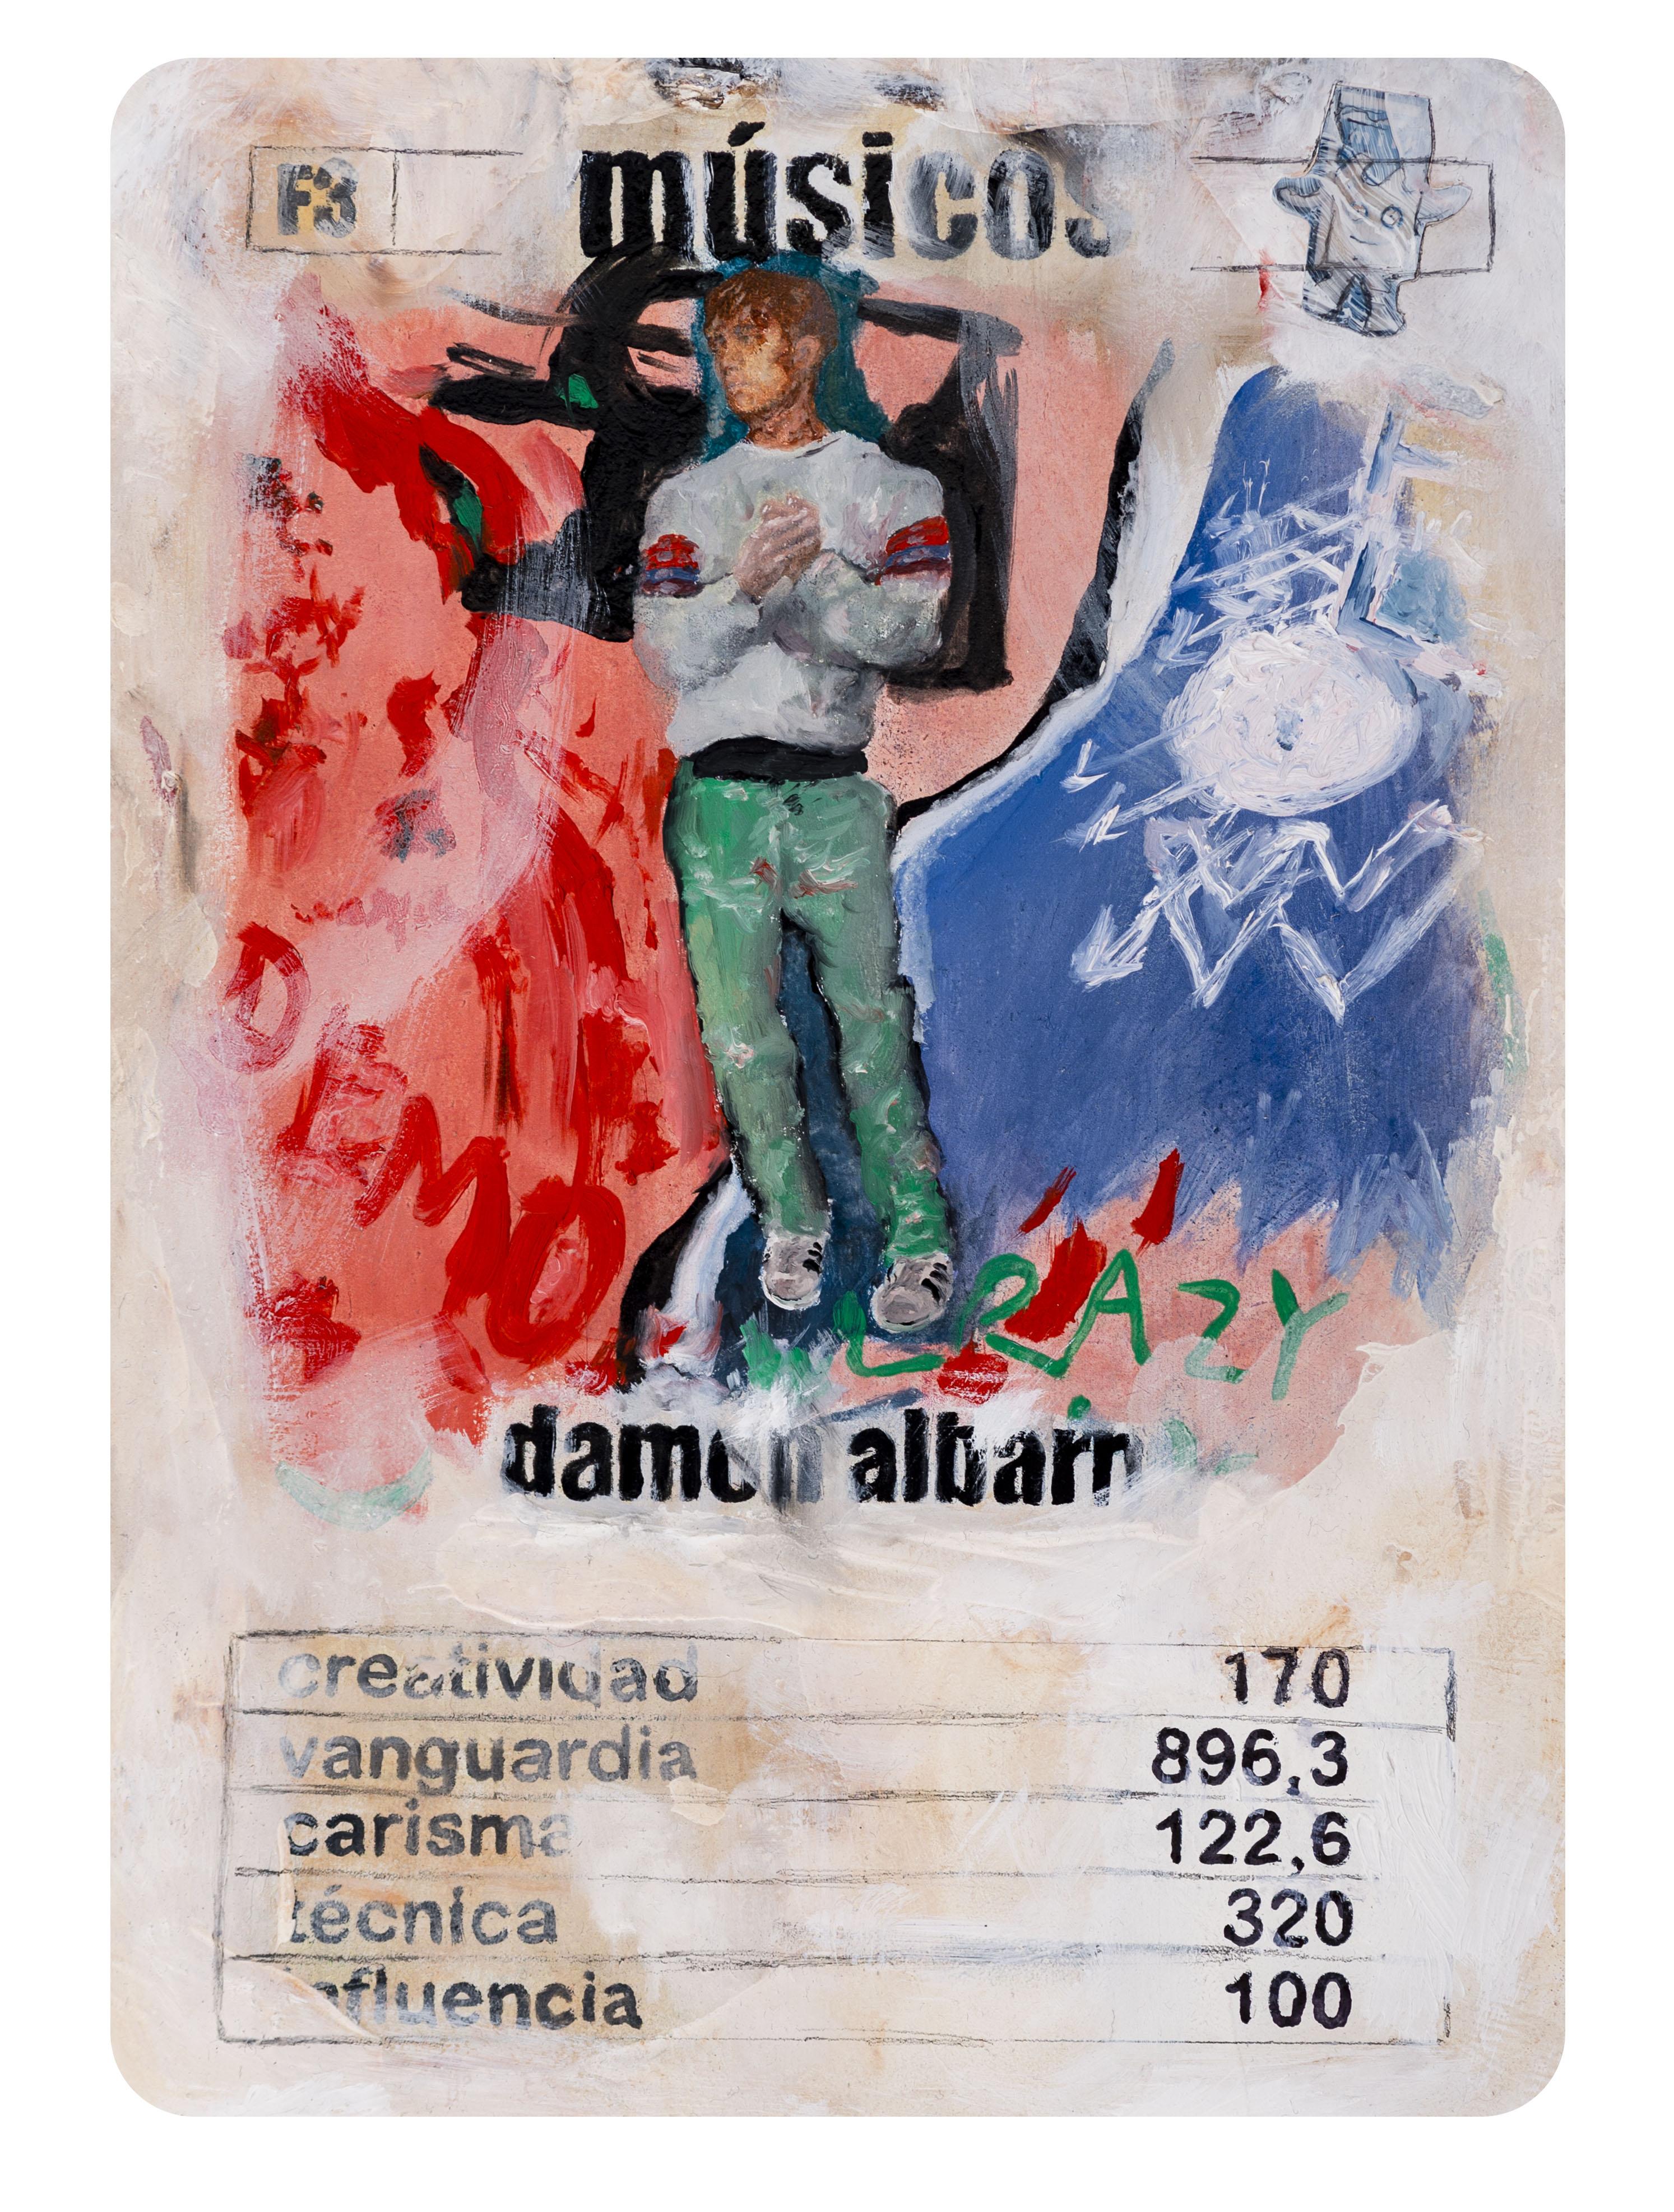 F3 Naipe Damon albarn